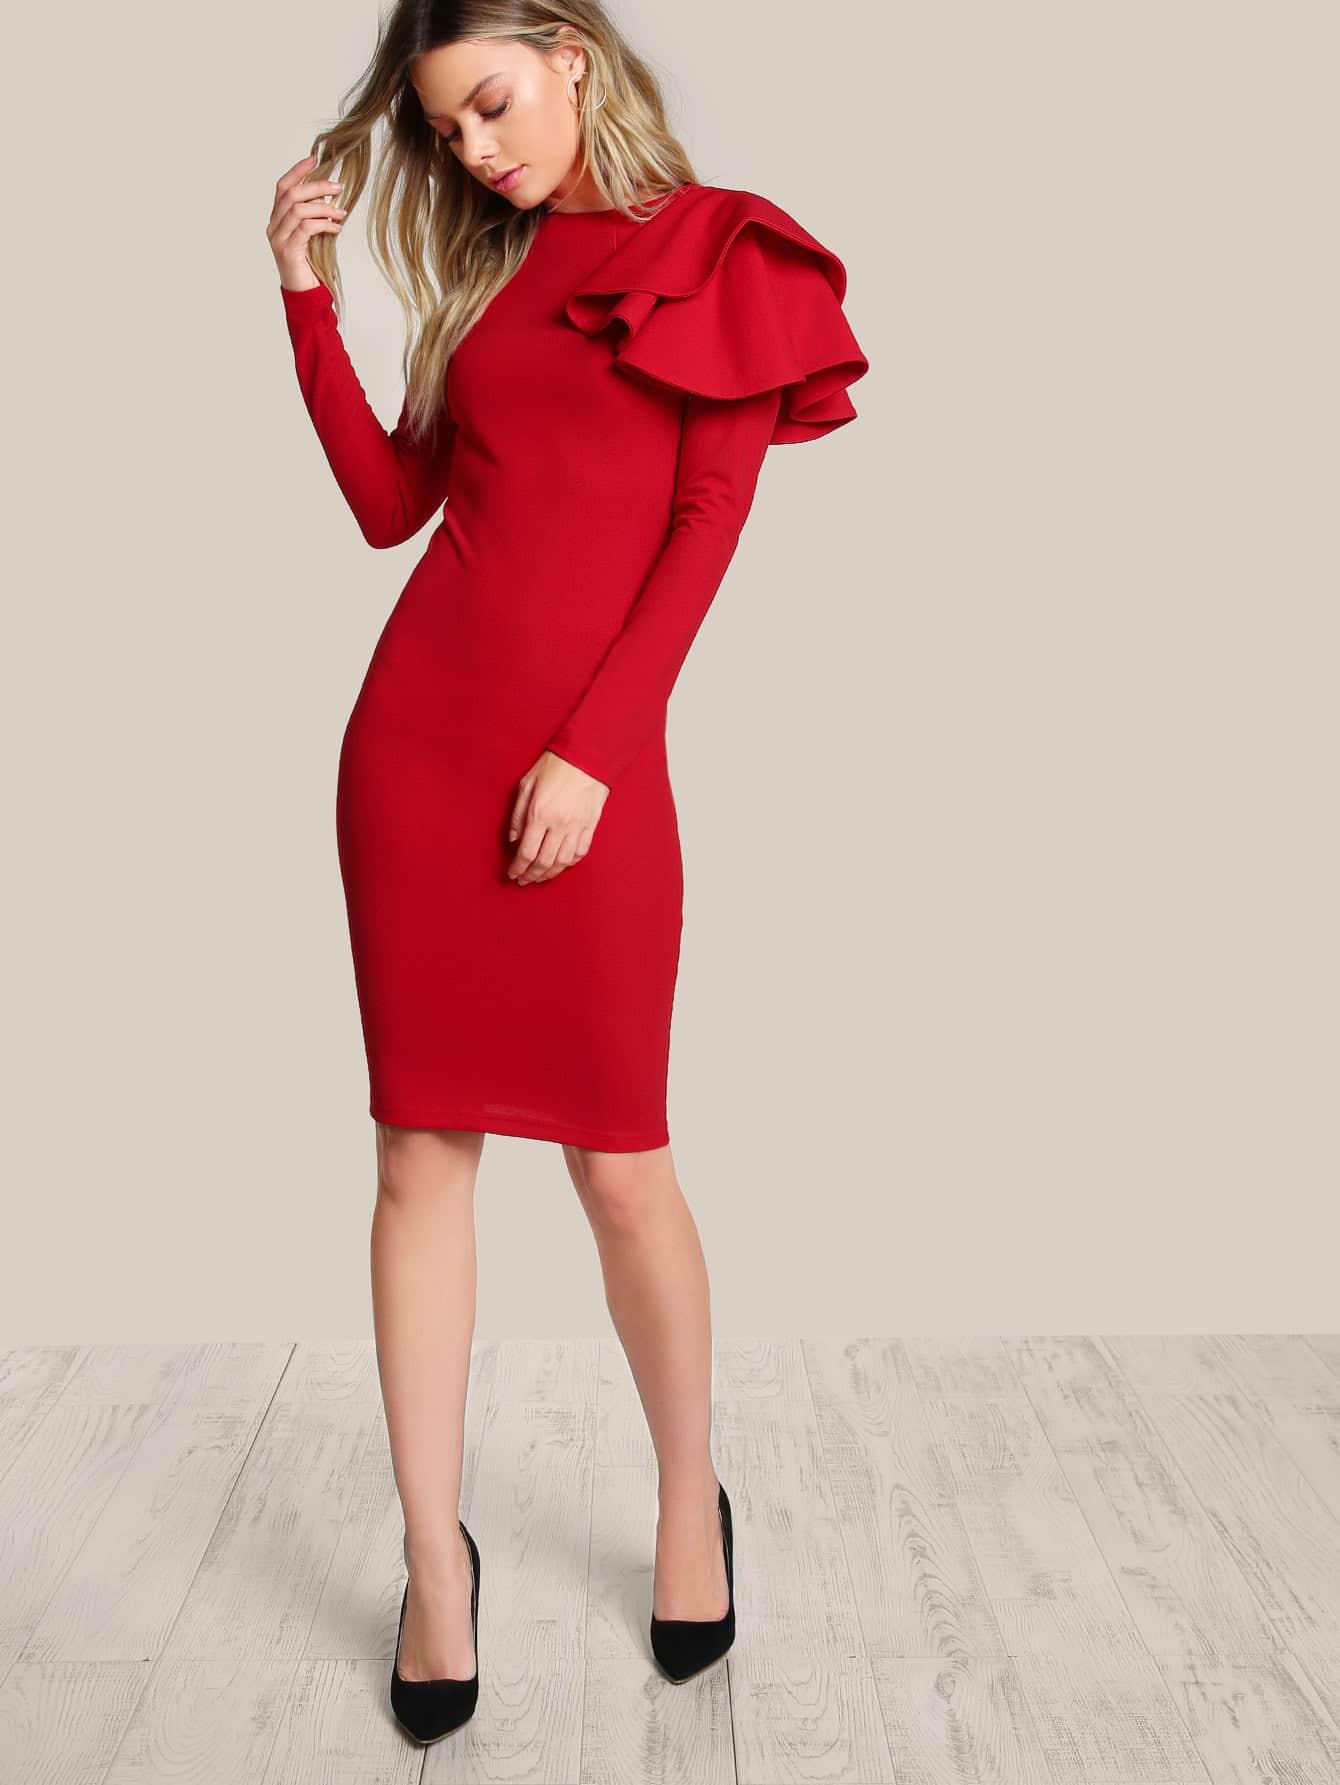 One Side Tiered Ruffle Trim Dress